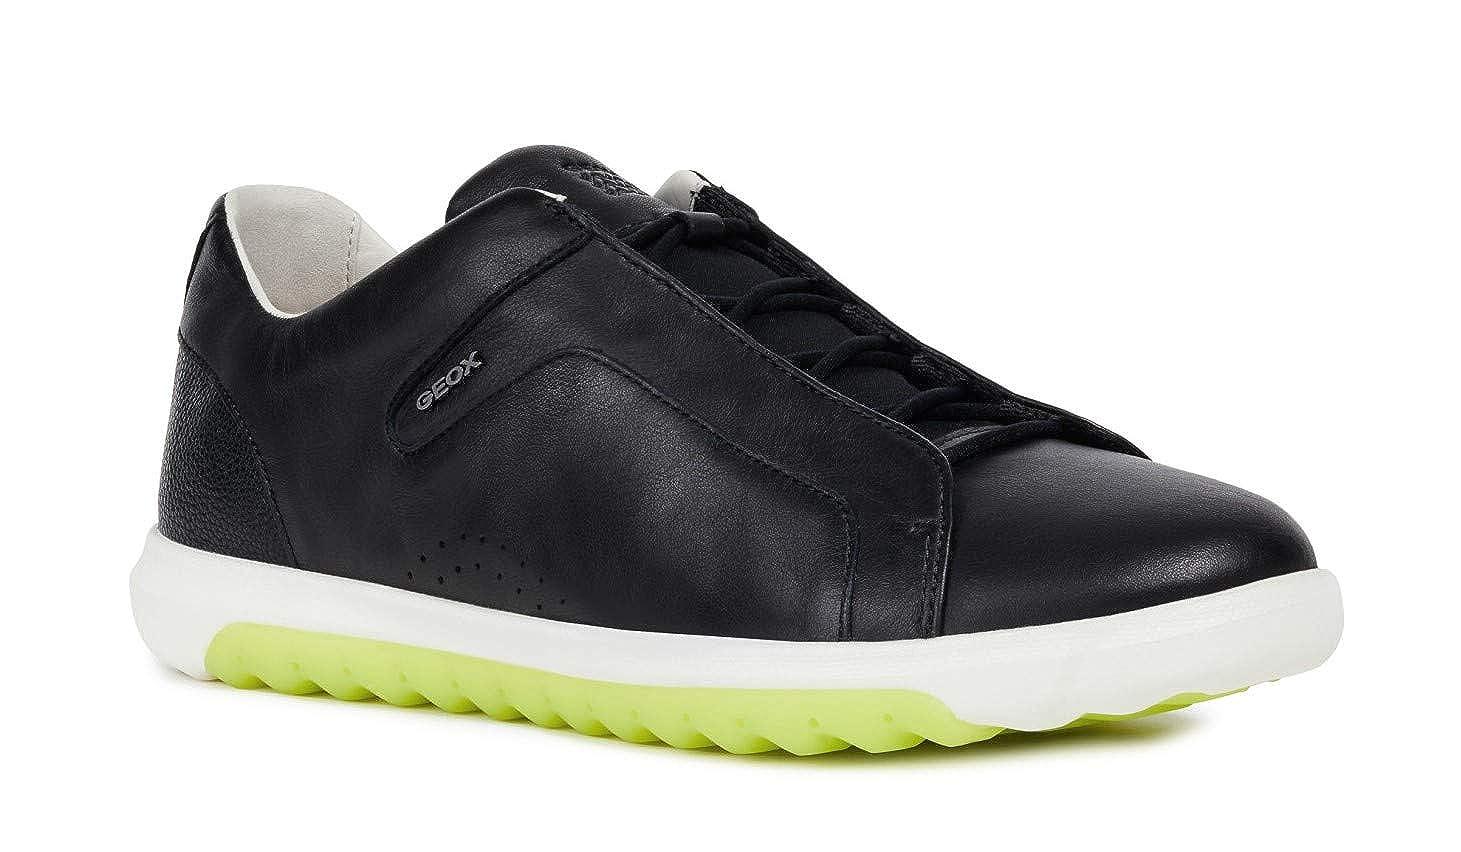 TALLA 44 EU. Geox NEXSIDE U927GA Hombre Zapatillas,mínimo,varón Zapatos Deportivos,Zapato con Cordones,Transpirable,Calzado,Zapatillas,Sneaker